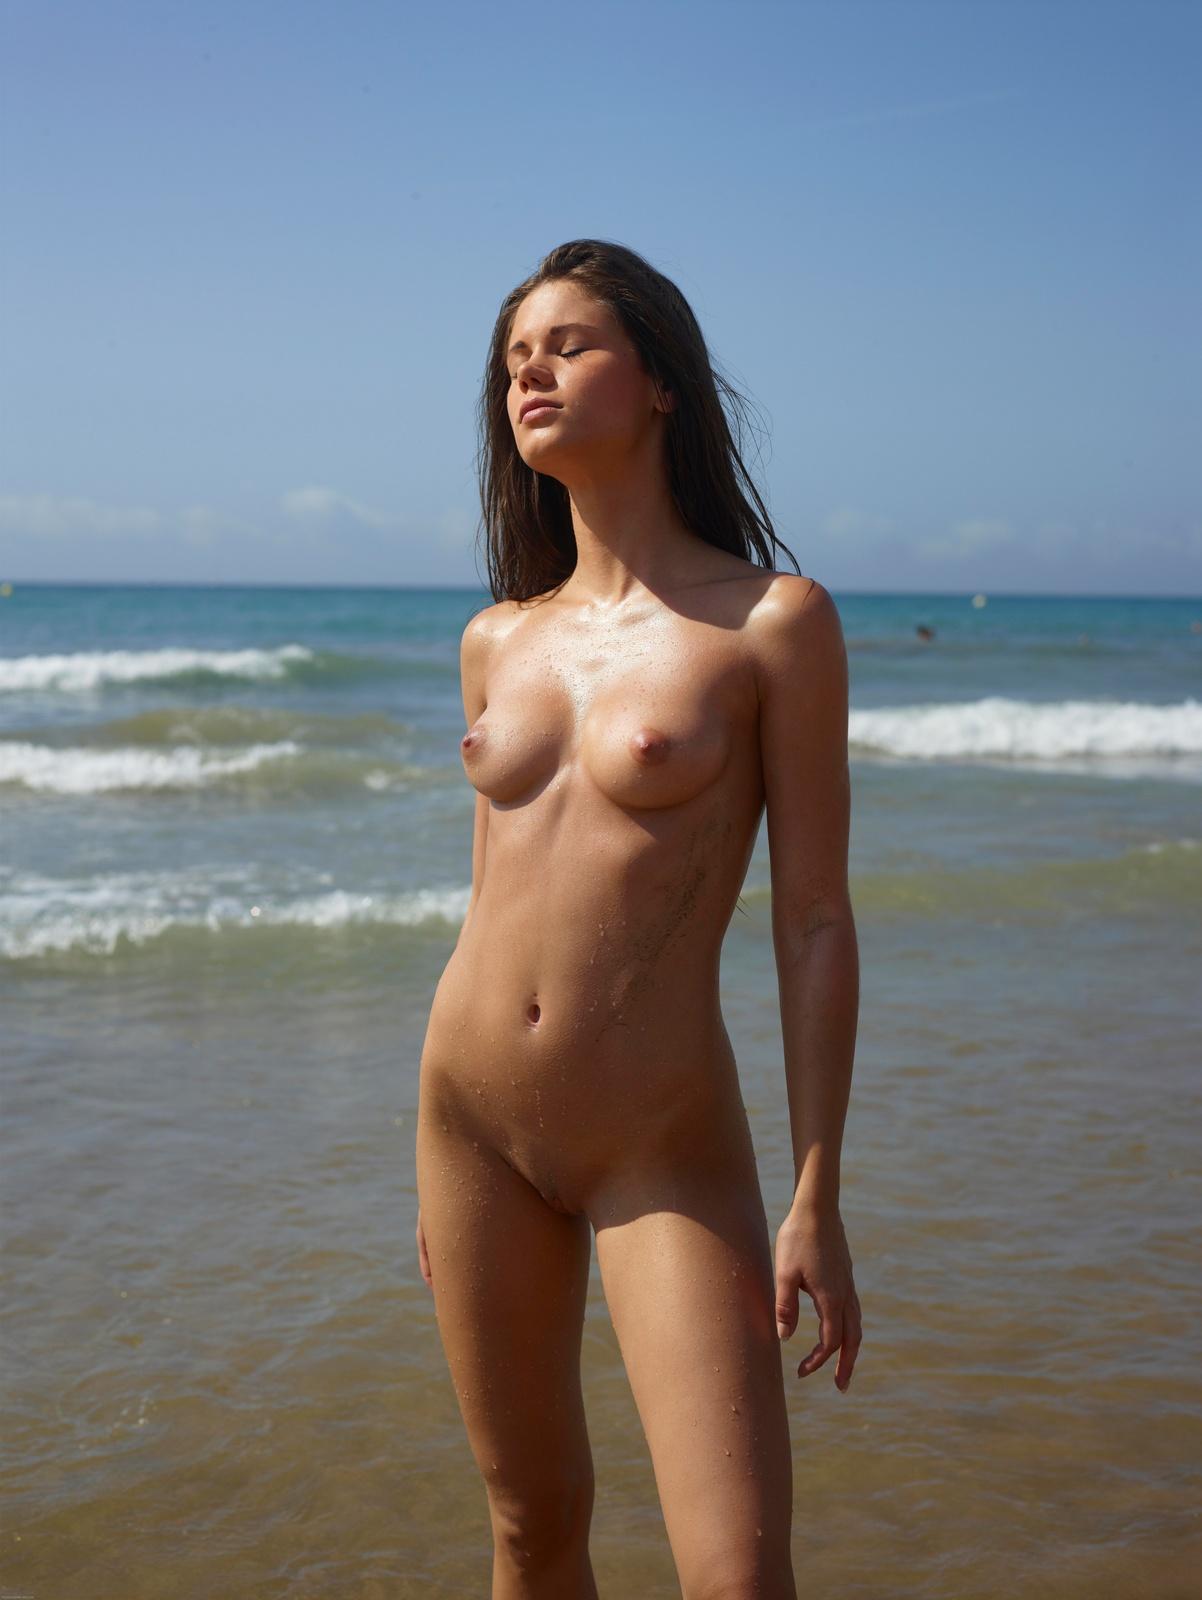 gallery   caprice on the nudist beach